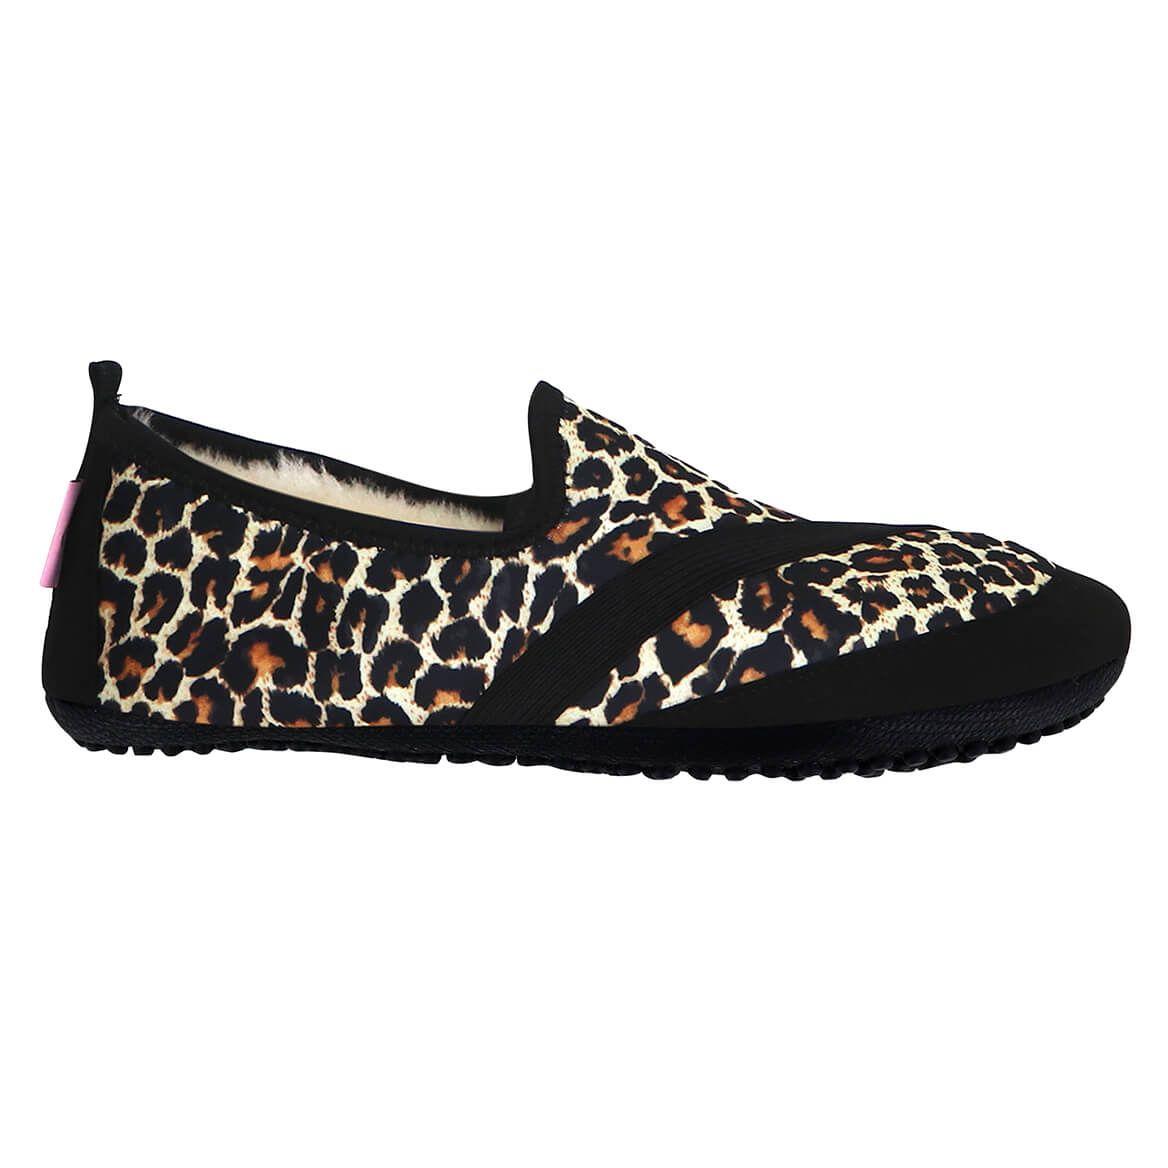 KoziKicks® Active Lifestyle Slippers, 1 Pair-359204